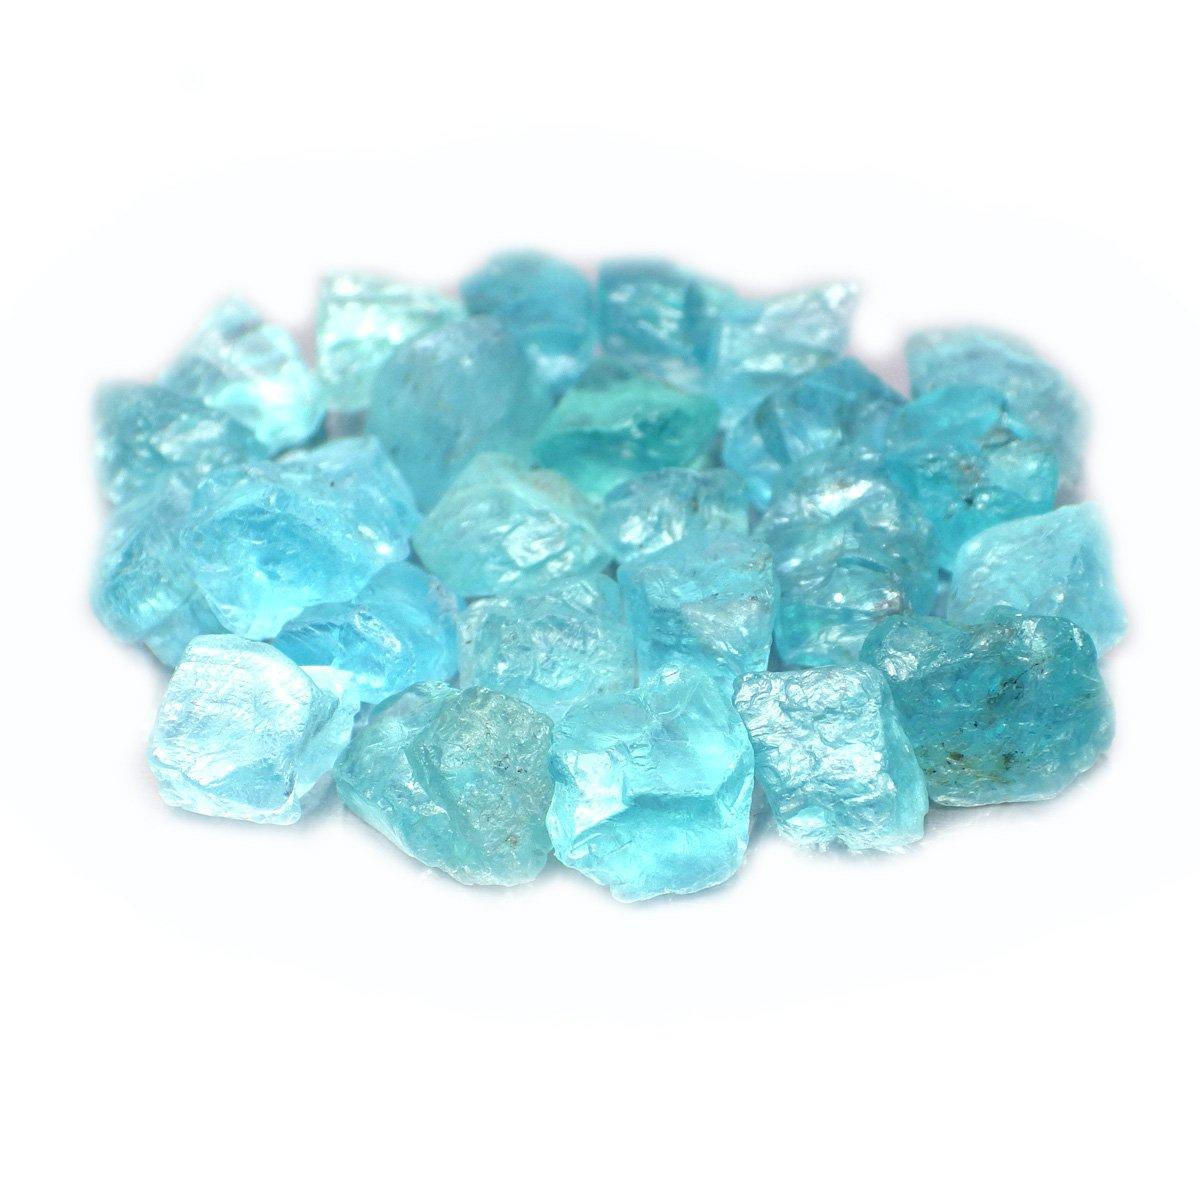 50.00 Ct. Unheated Natural Rough Neon Blue Apatite Specimen